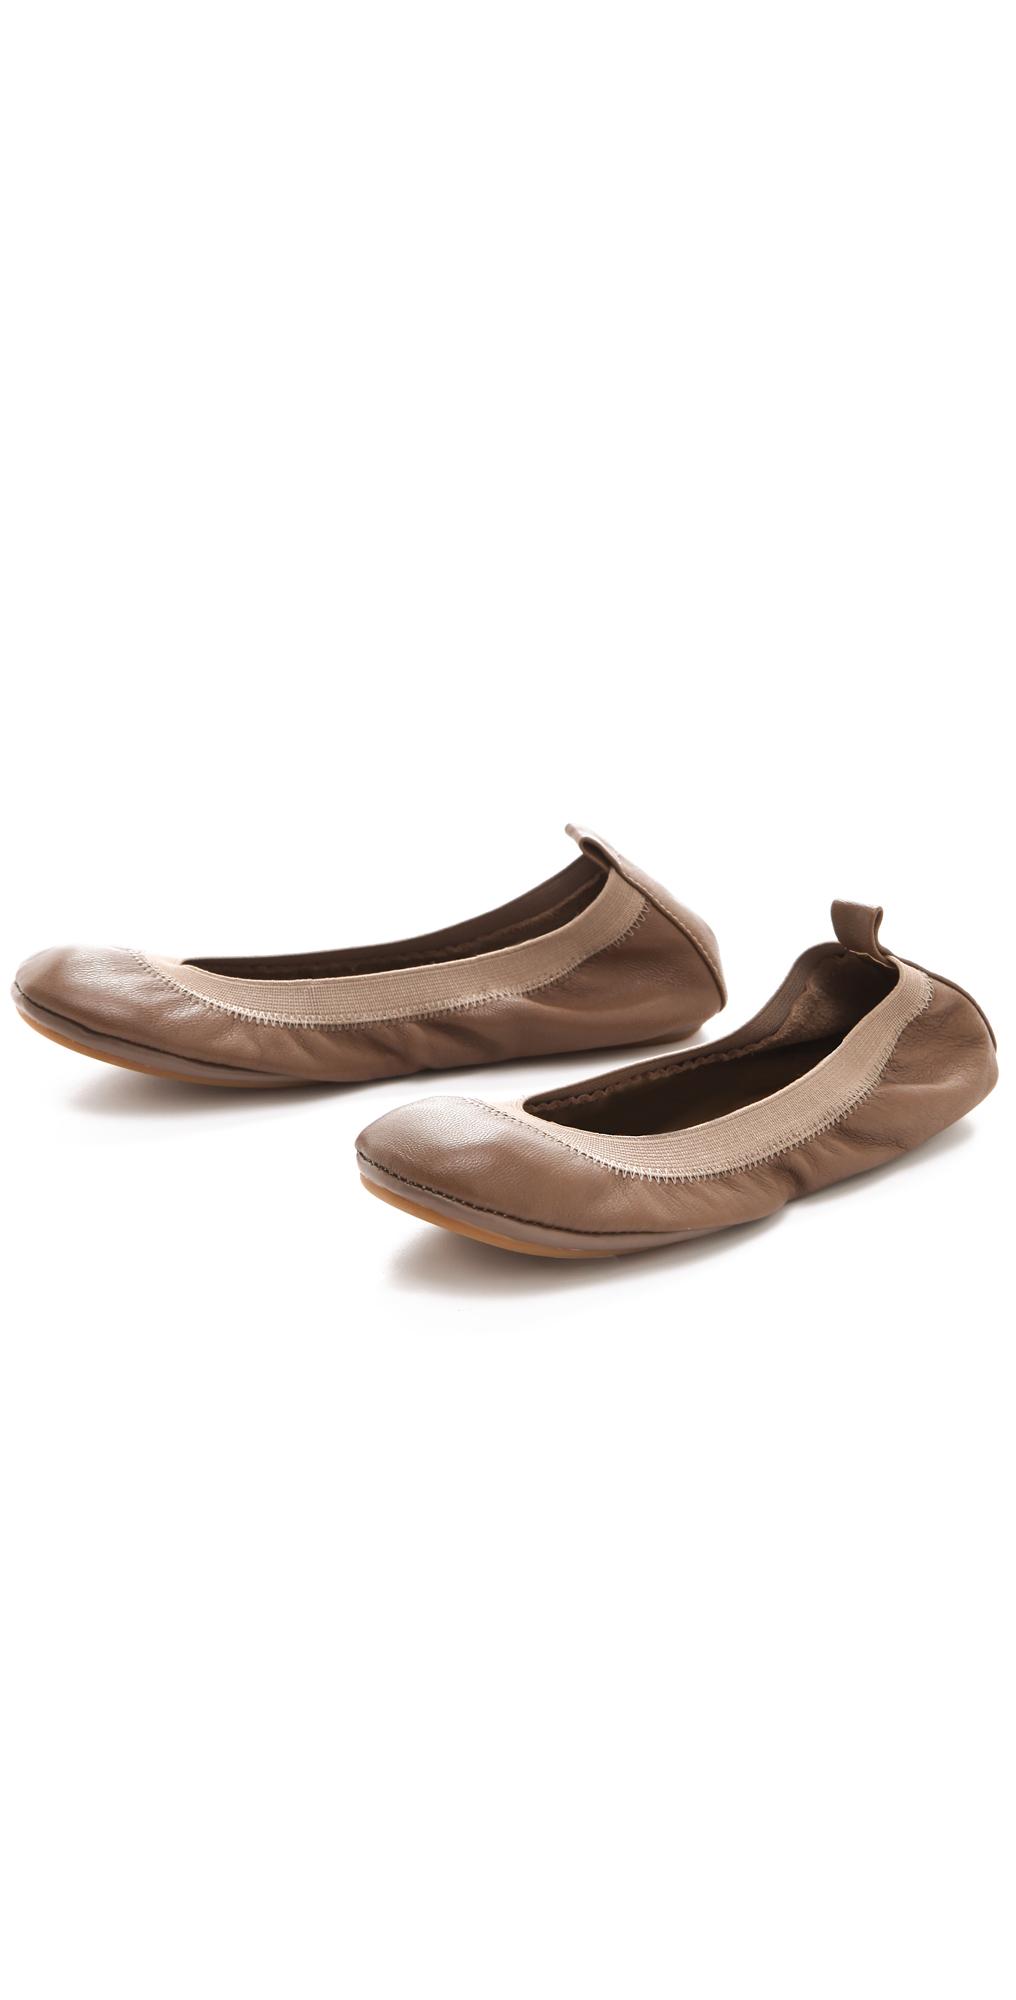 6ec994089bd1 Lyst - Yosi Samra Elastic Top Line Ballet Flats Taupe in Brown